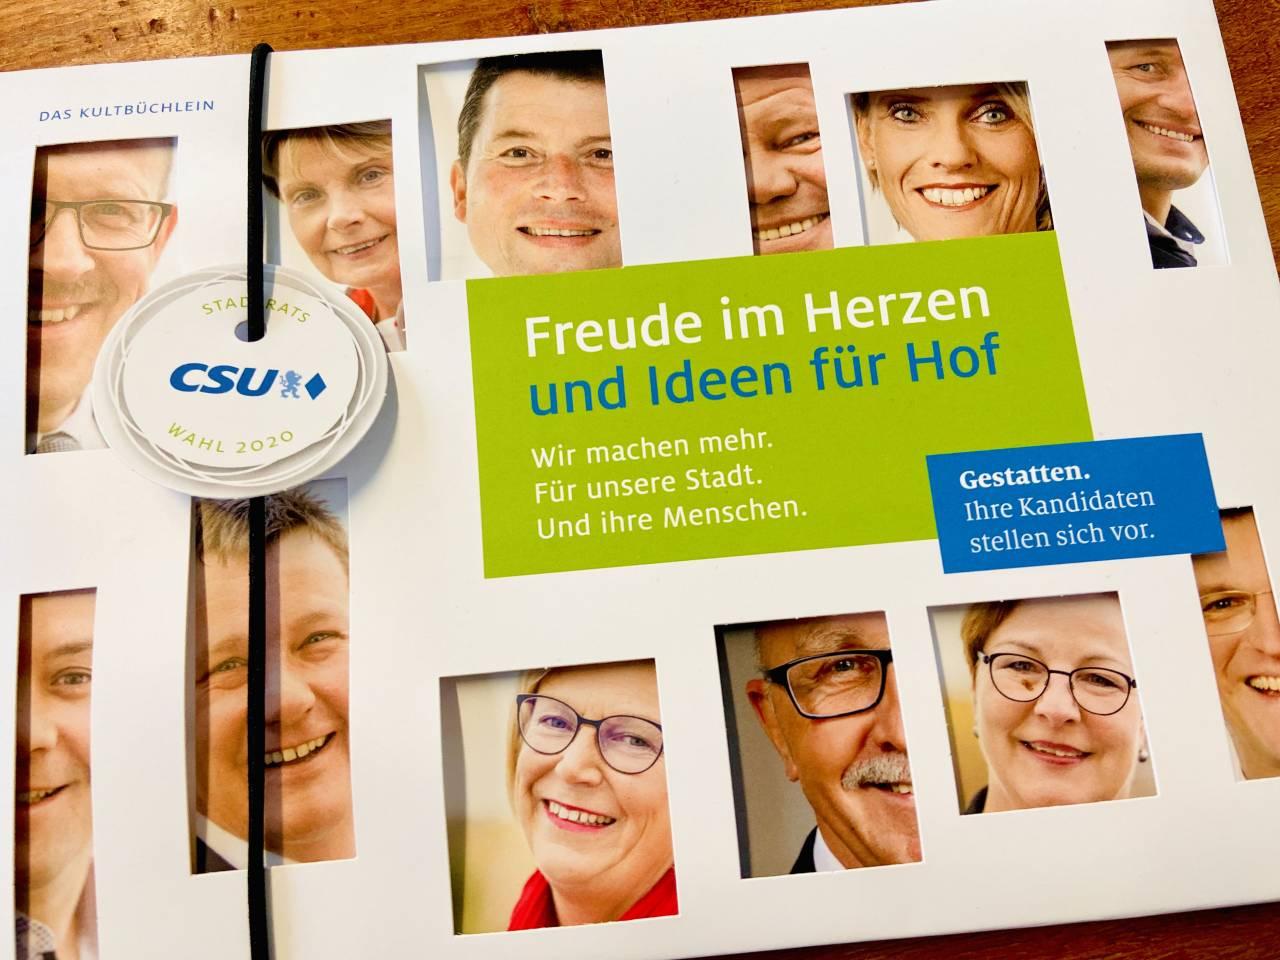 #mehrfuerhof CSU